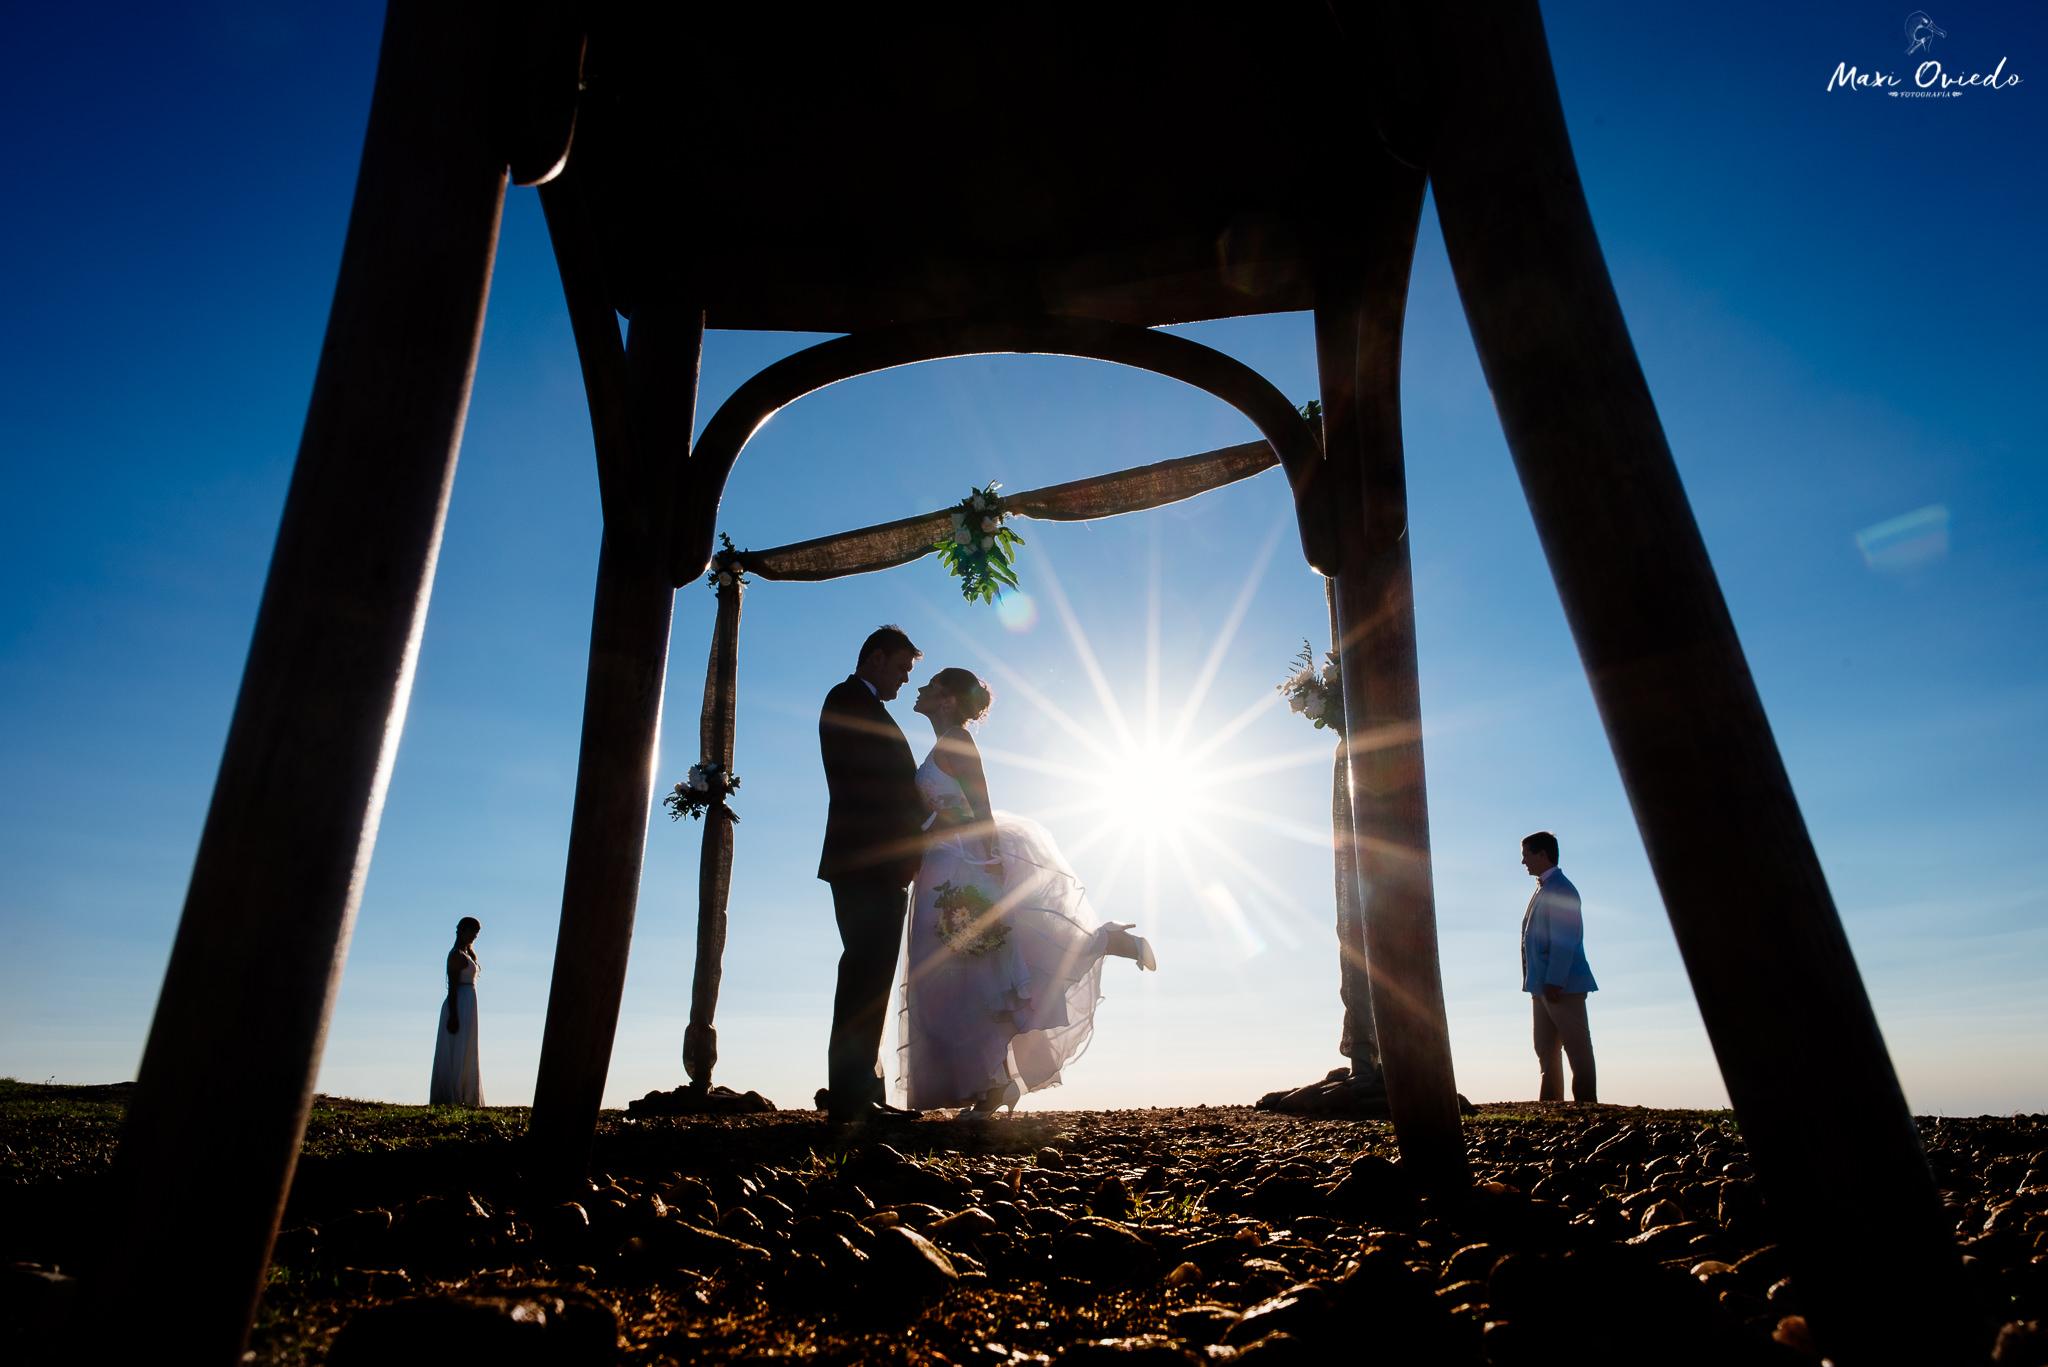 boda sextuple la cumbre cordoba cuchi corral fotografo de bodas fotografo de casamientos rosario san nicolas argentina vestido de novia ramo de novia-22.jpg